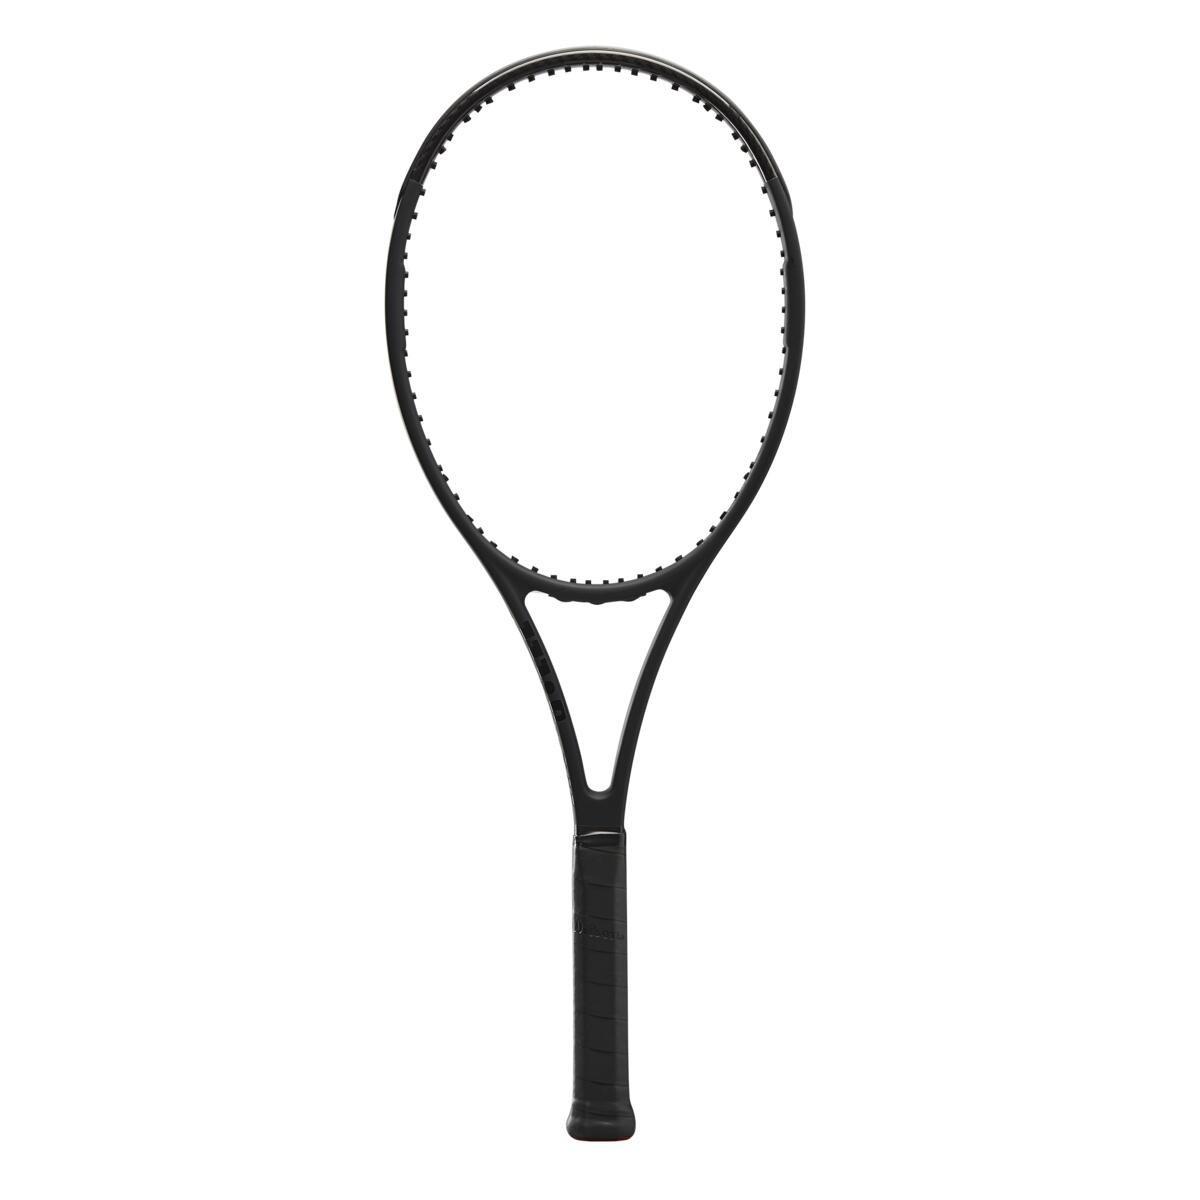 Raquete de Tênis Wilson Pro Staff 97L - V13.0 - 290g  - PROTENISTA